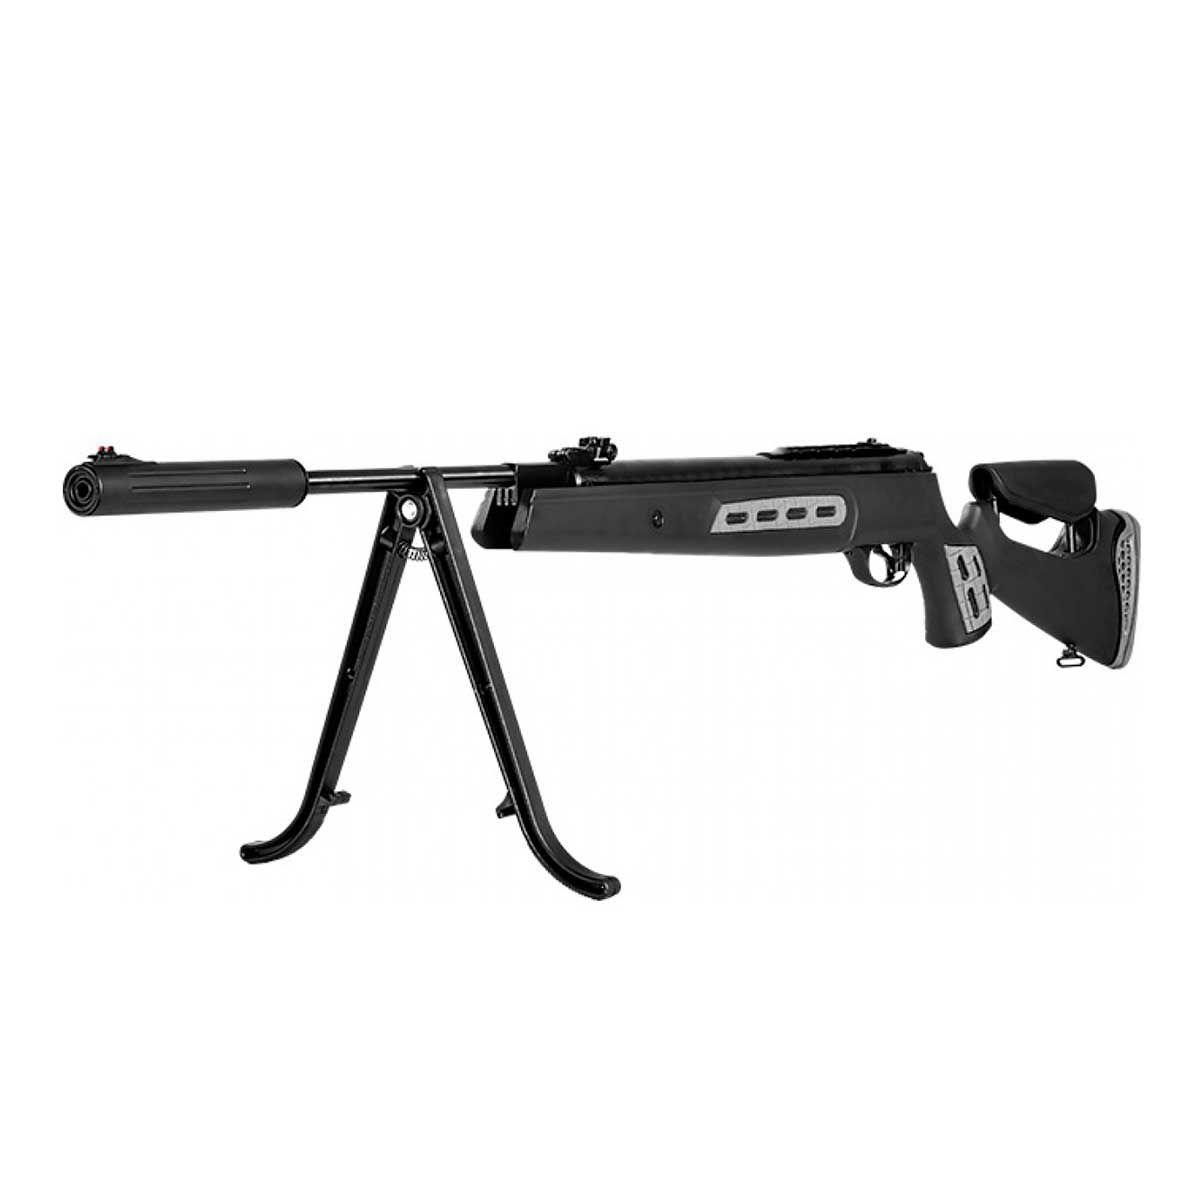 Carabina Pressão Hatsan Ht 125 Sniper Vortex Gás Ram 5.5mm